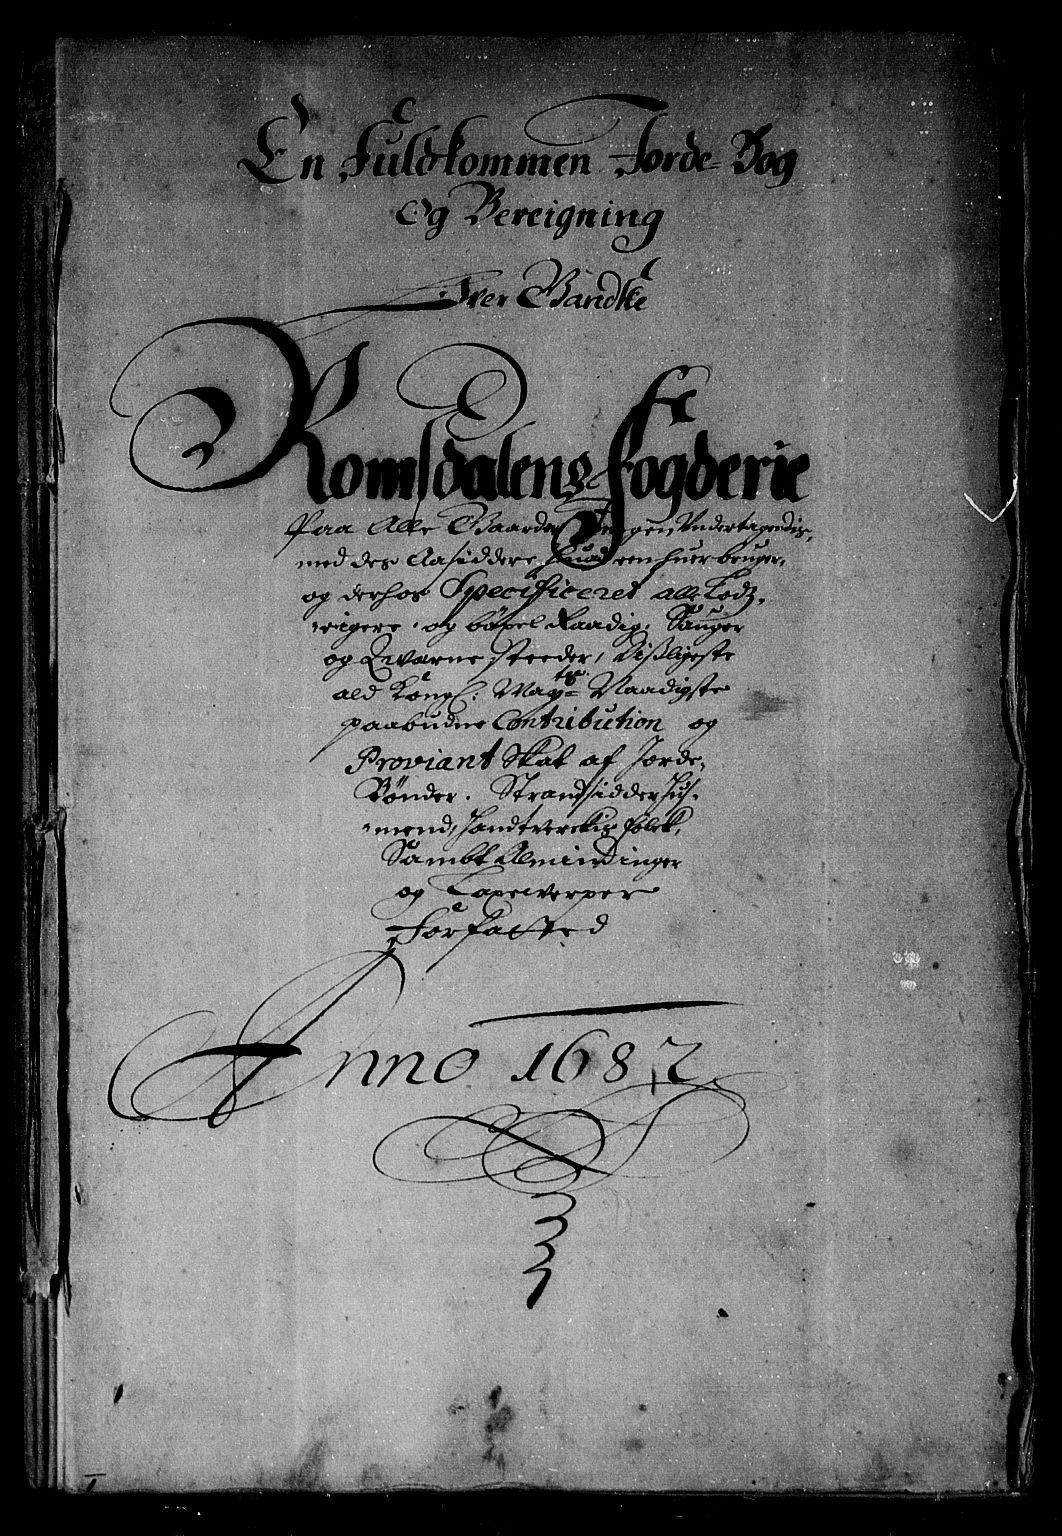 RA, Rentekammeret inntil 1814, Reviderte regnskaper, Stiftamtstueregnskaper, Trondheim stiftamt og Nordland amt, R/Rg/L0068b: Trondheim stiftamt og Nordland amt, 1682